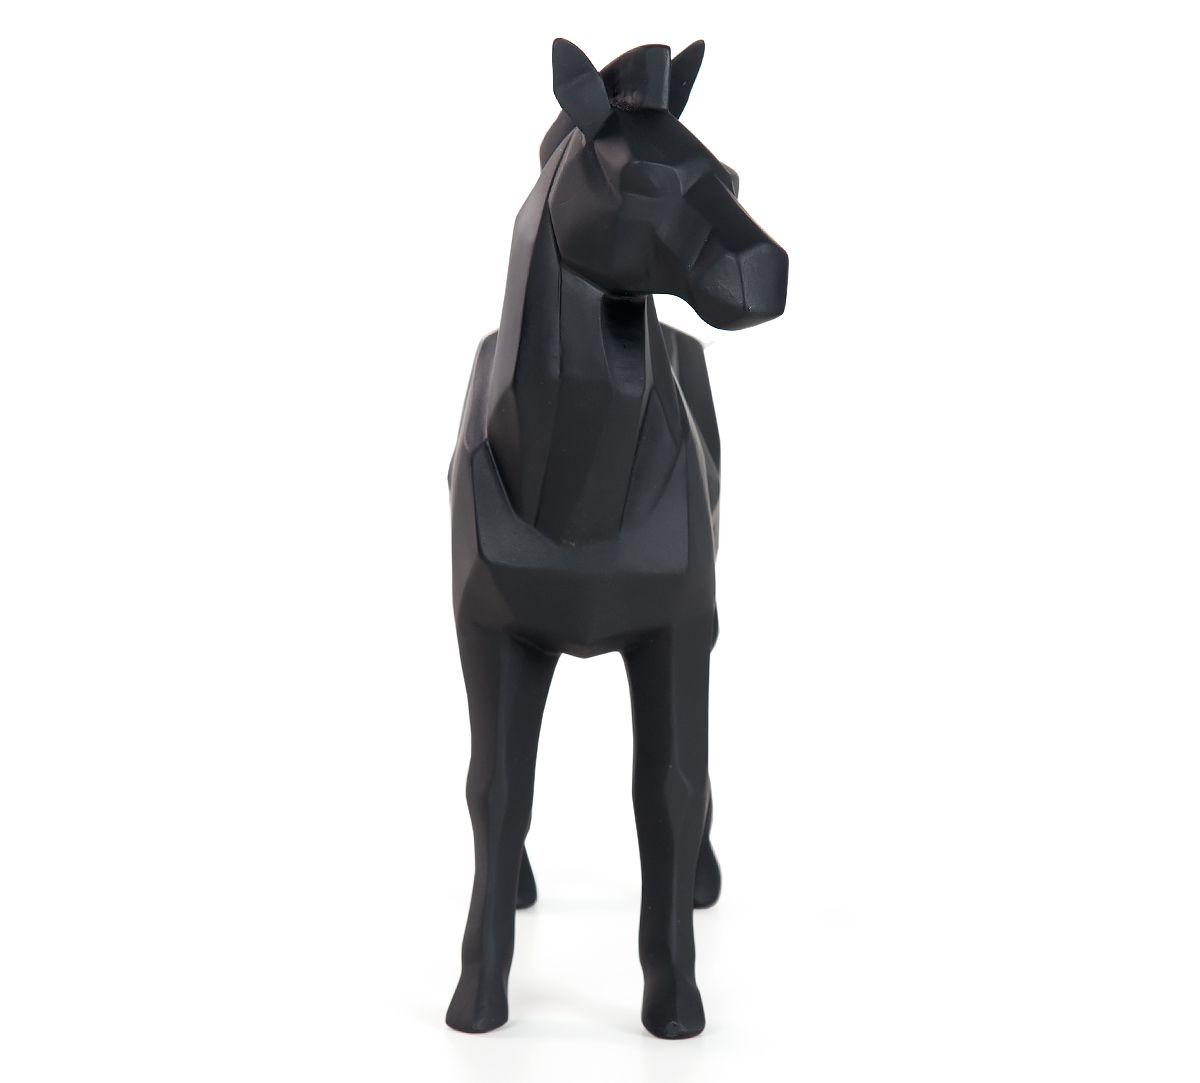 Black Beauty Figurine